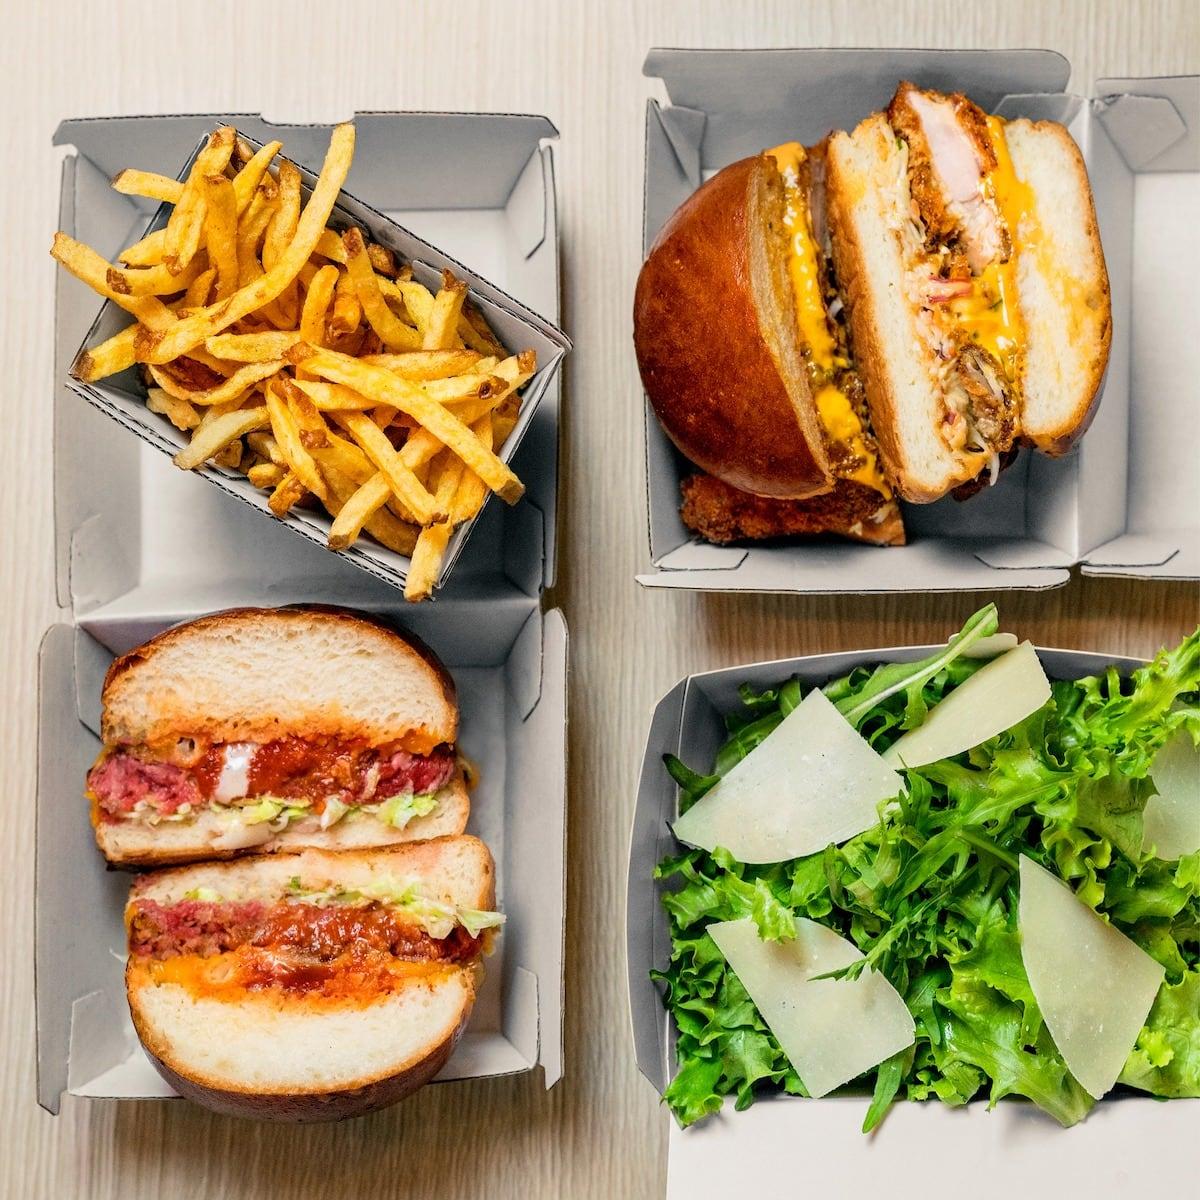 Burgers, salad and fries at Marcel Burger